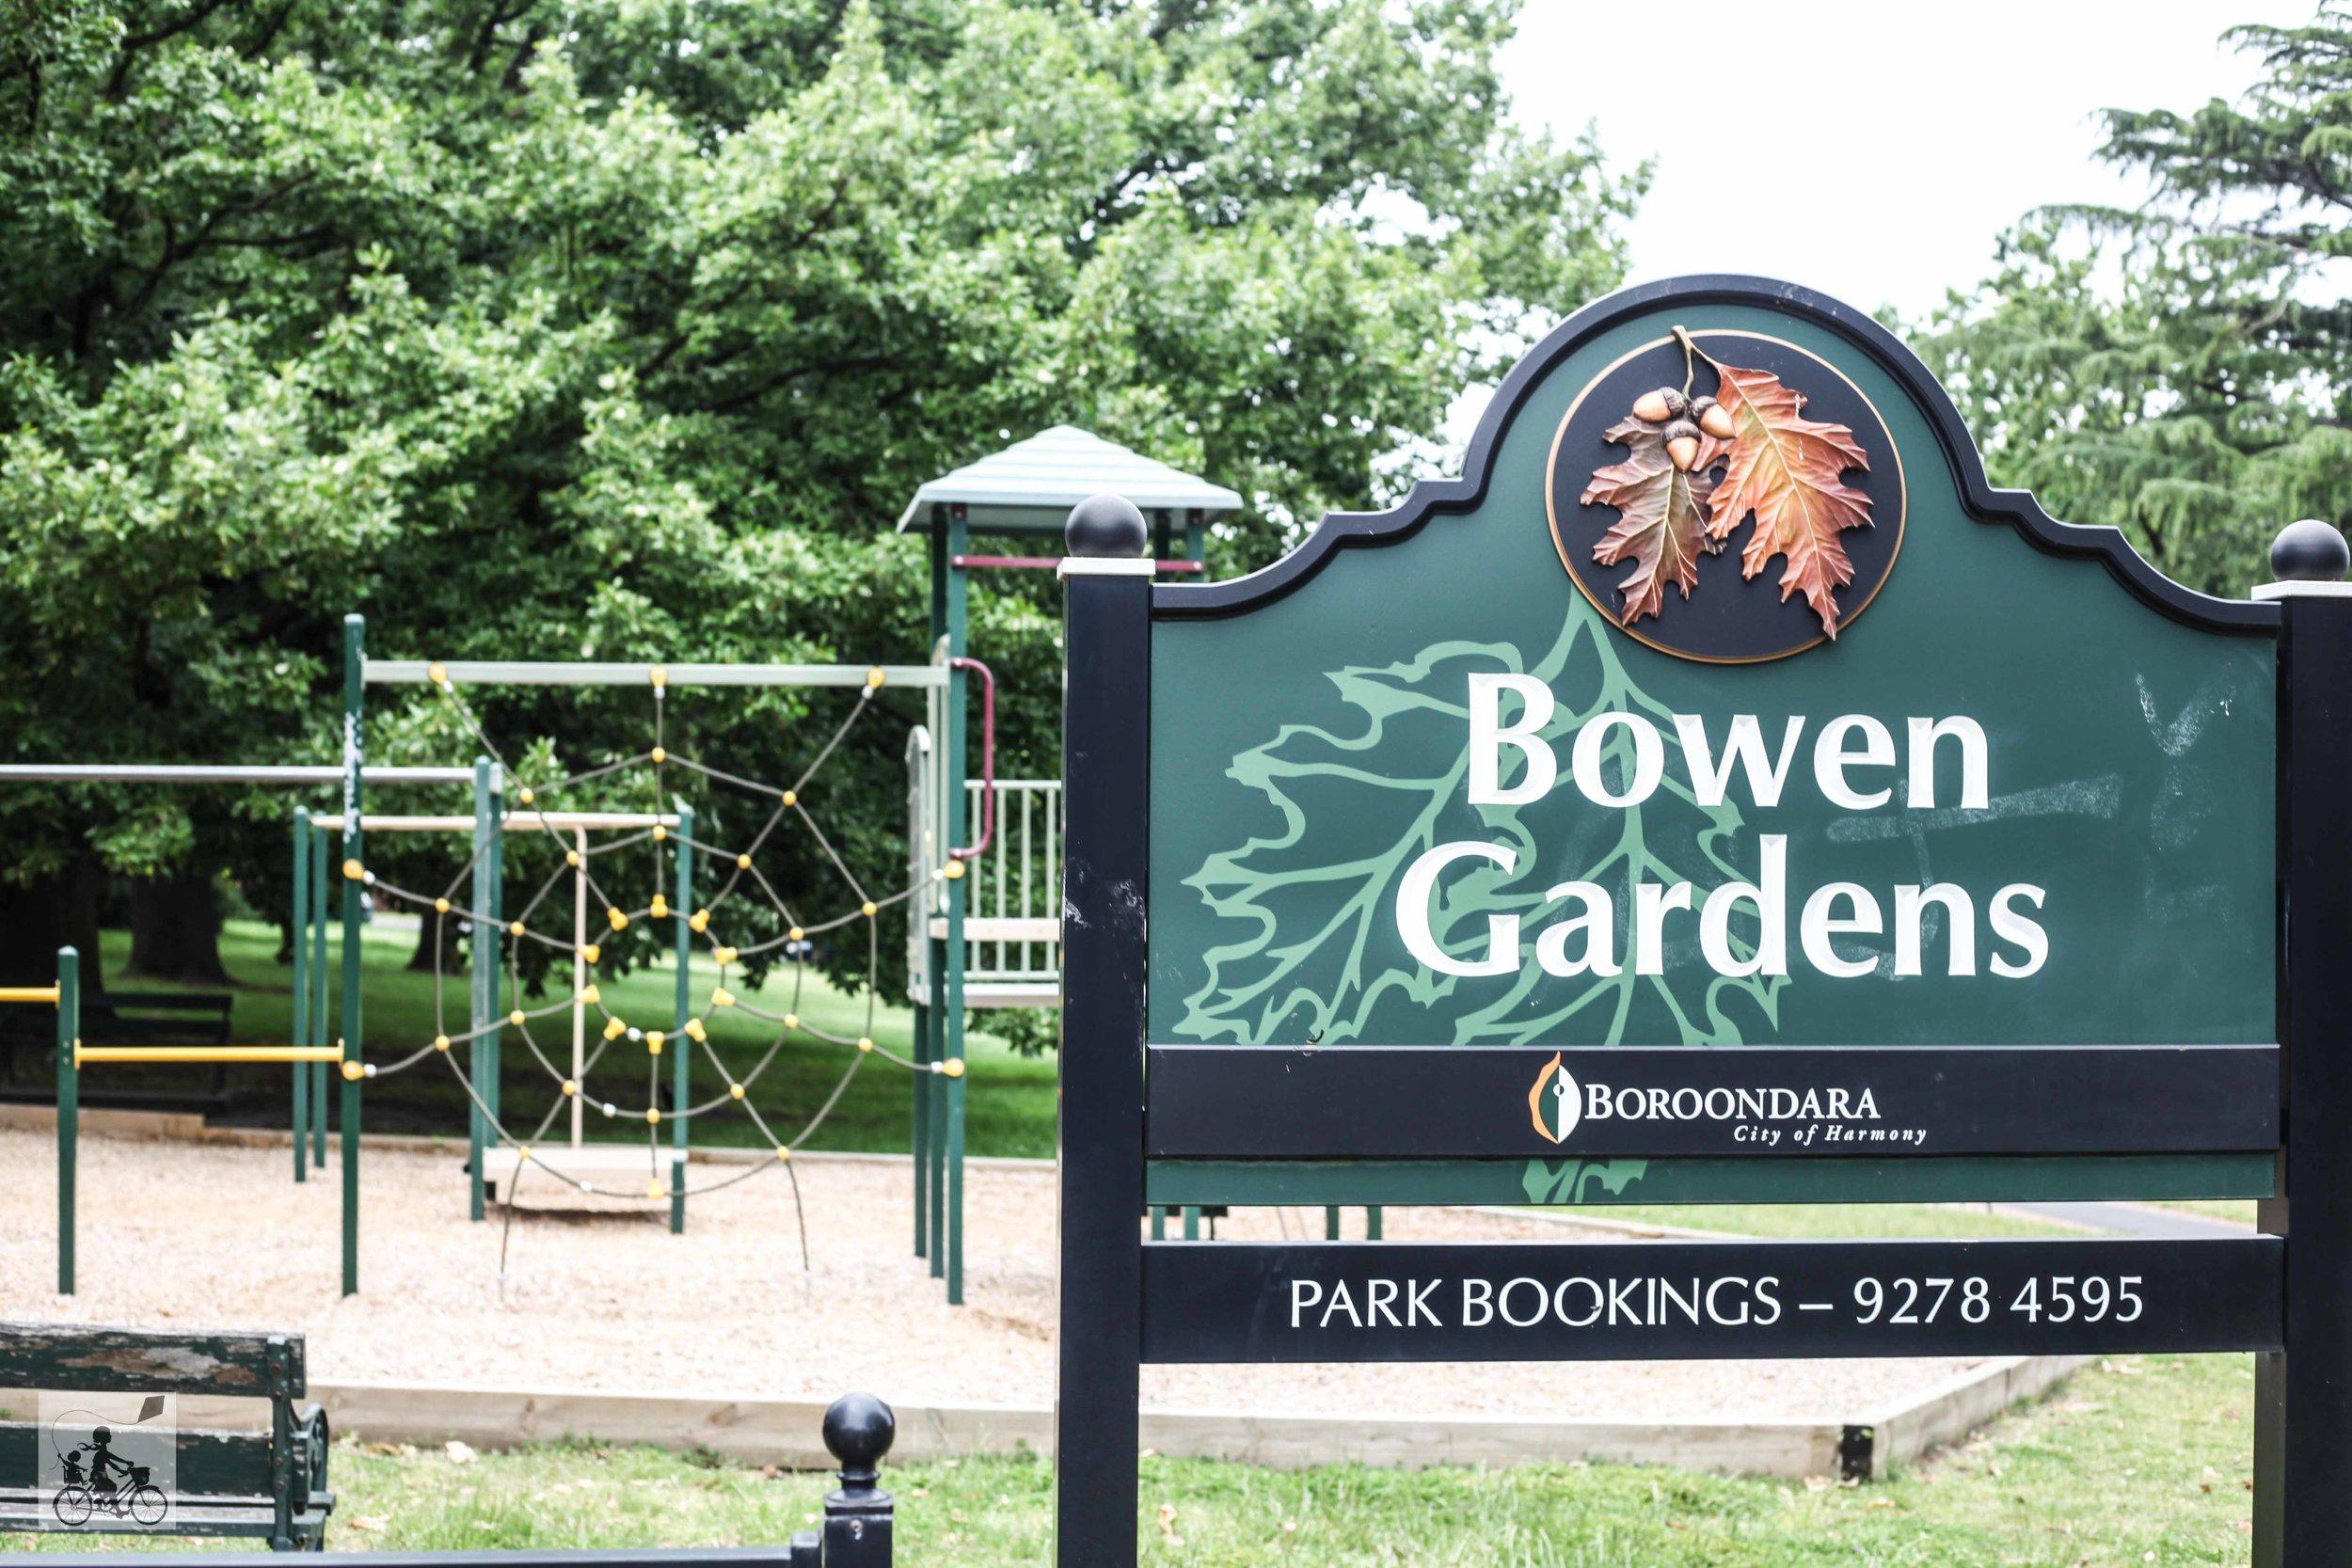 Mamma Knows East - Bowen Gardens